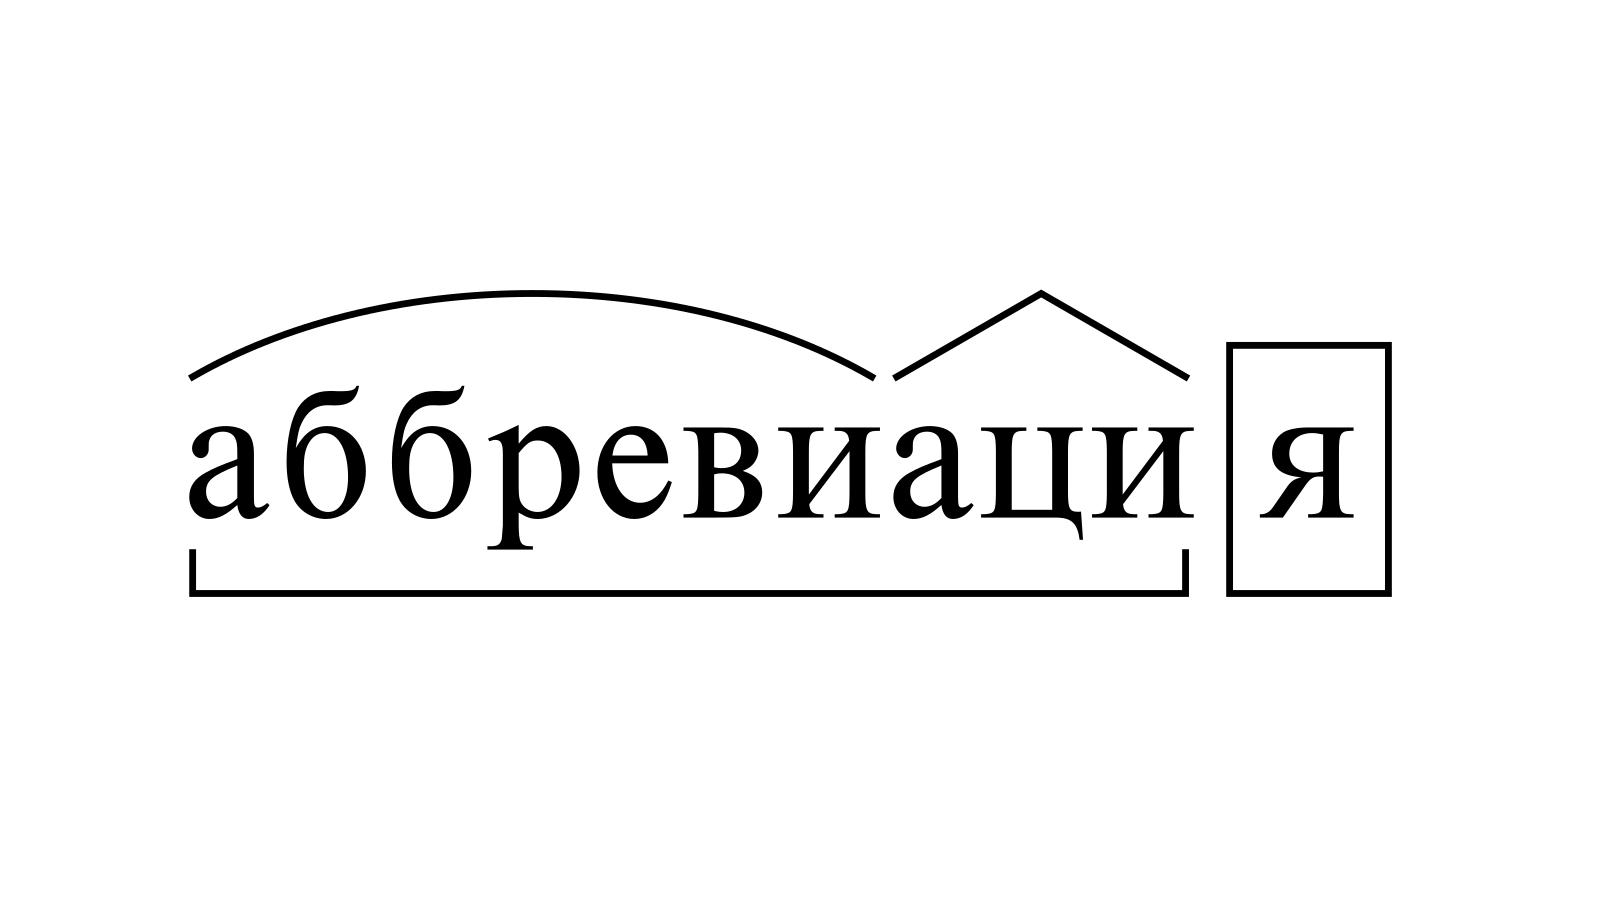 Разбор слова «аббревиация» по составу